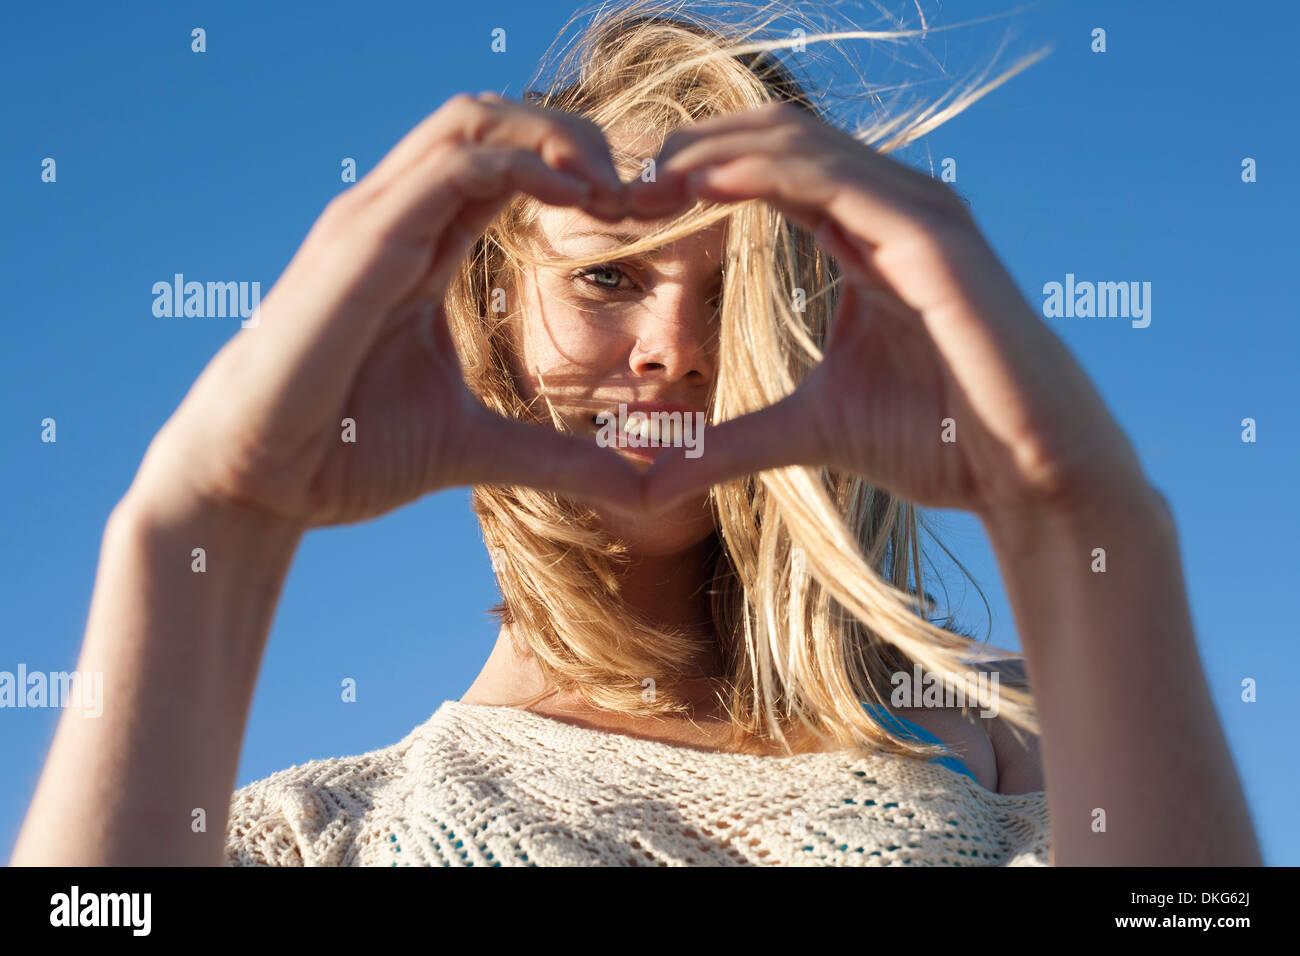 Retrato de mujer joven corazón hacer firmar, Breezy Point, Queens, Nueva York, EE.UU. Imagen De Stock